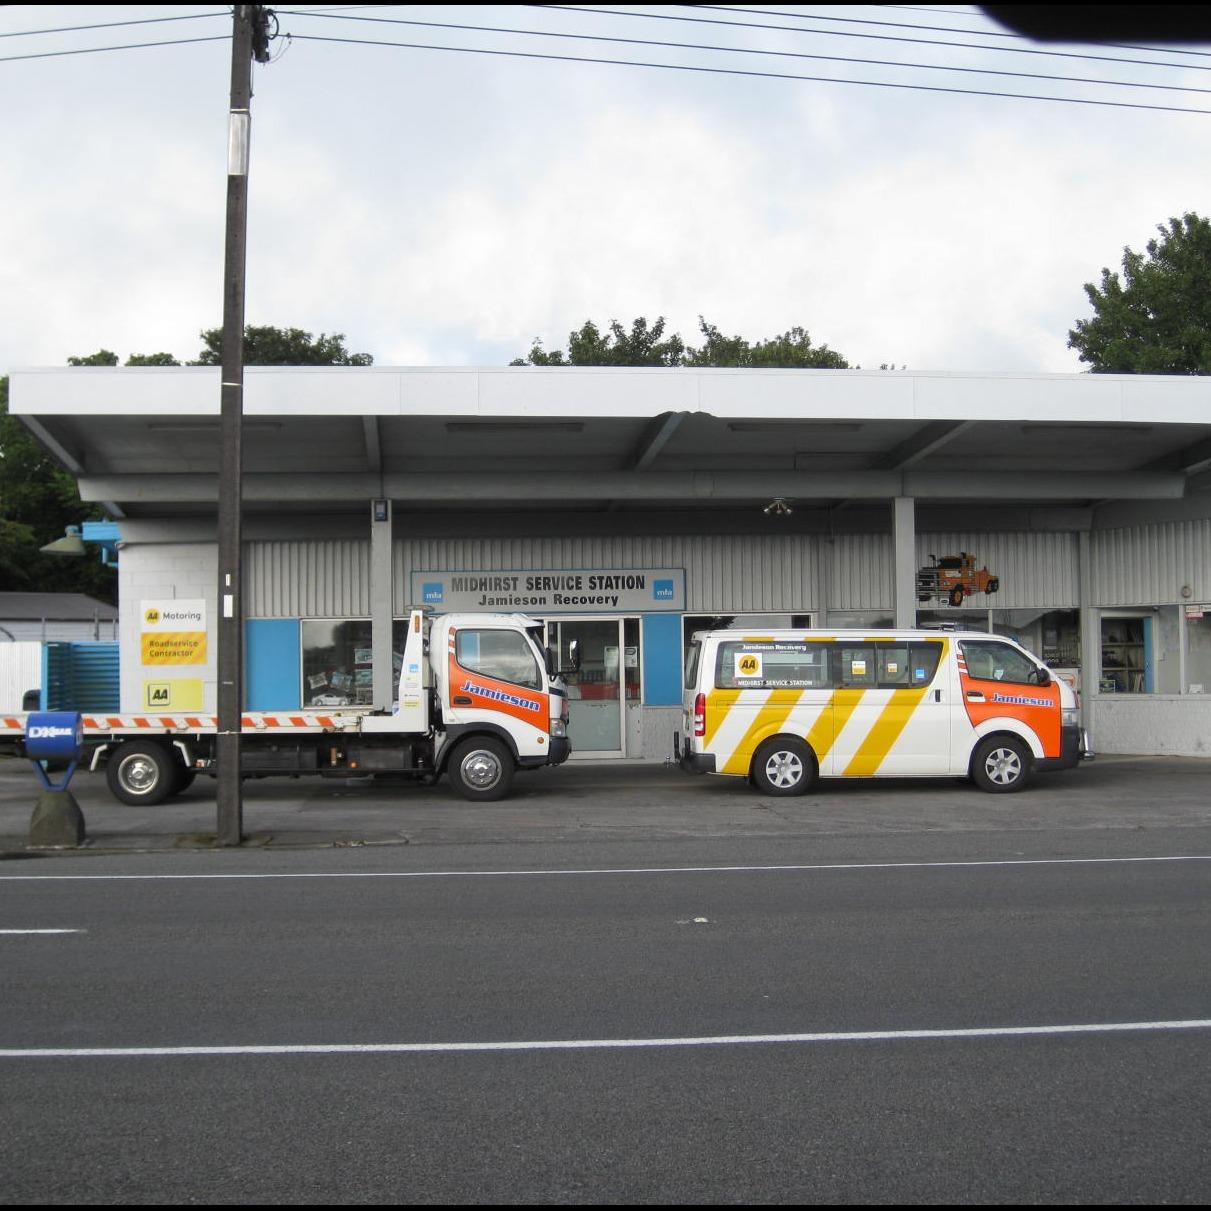 Midhirst Service Station